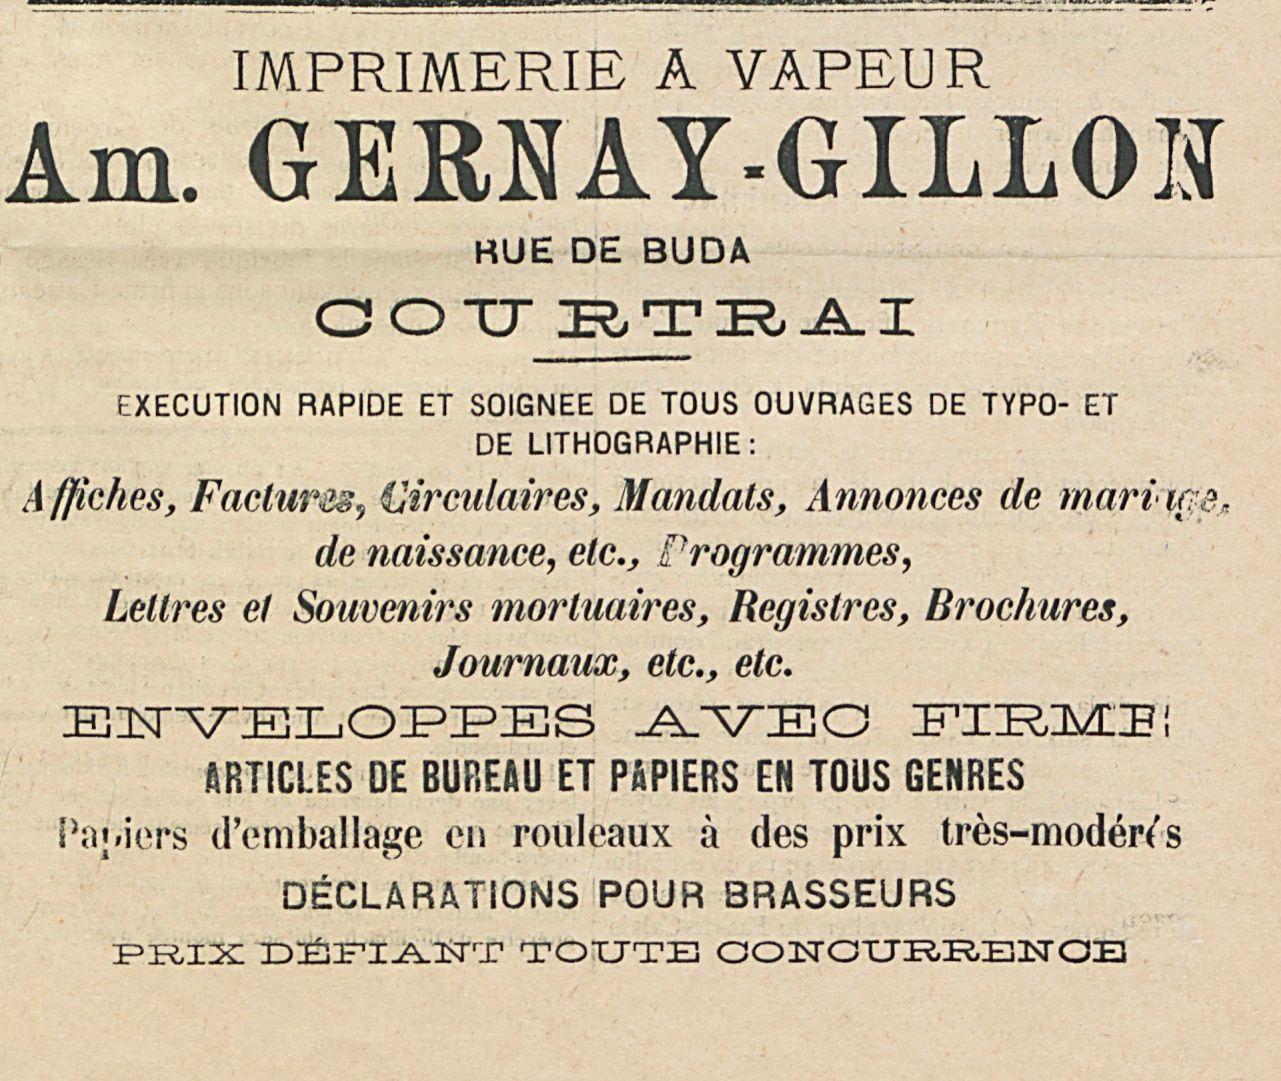 Am GERNAY-GILLON